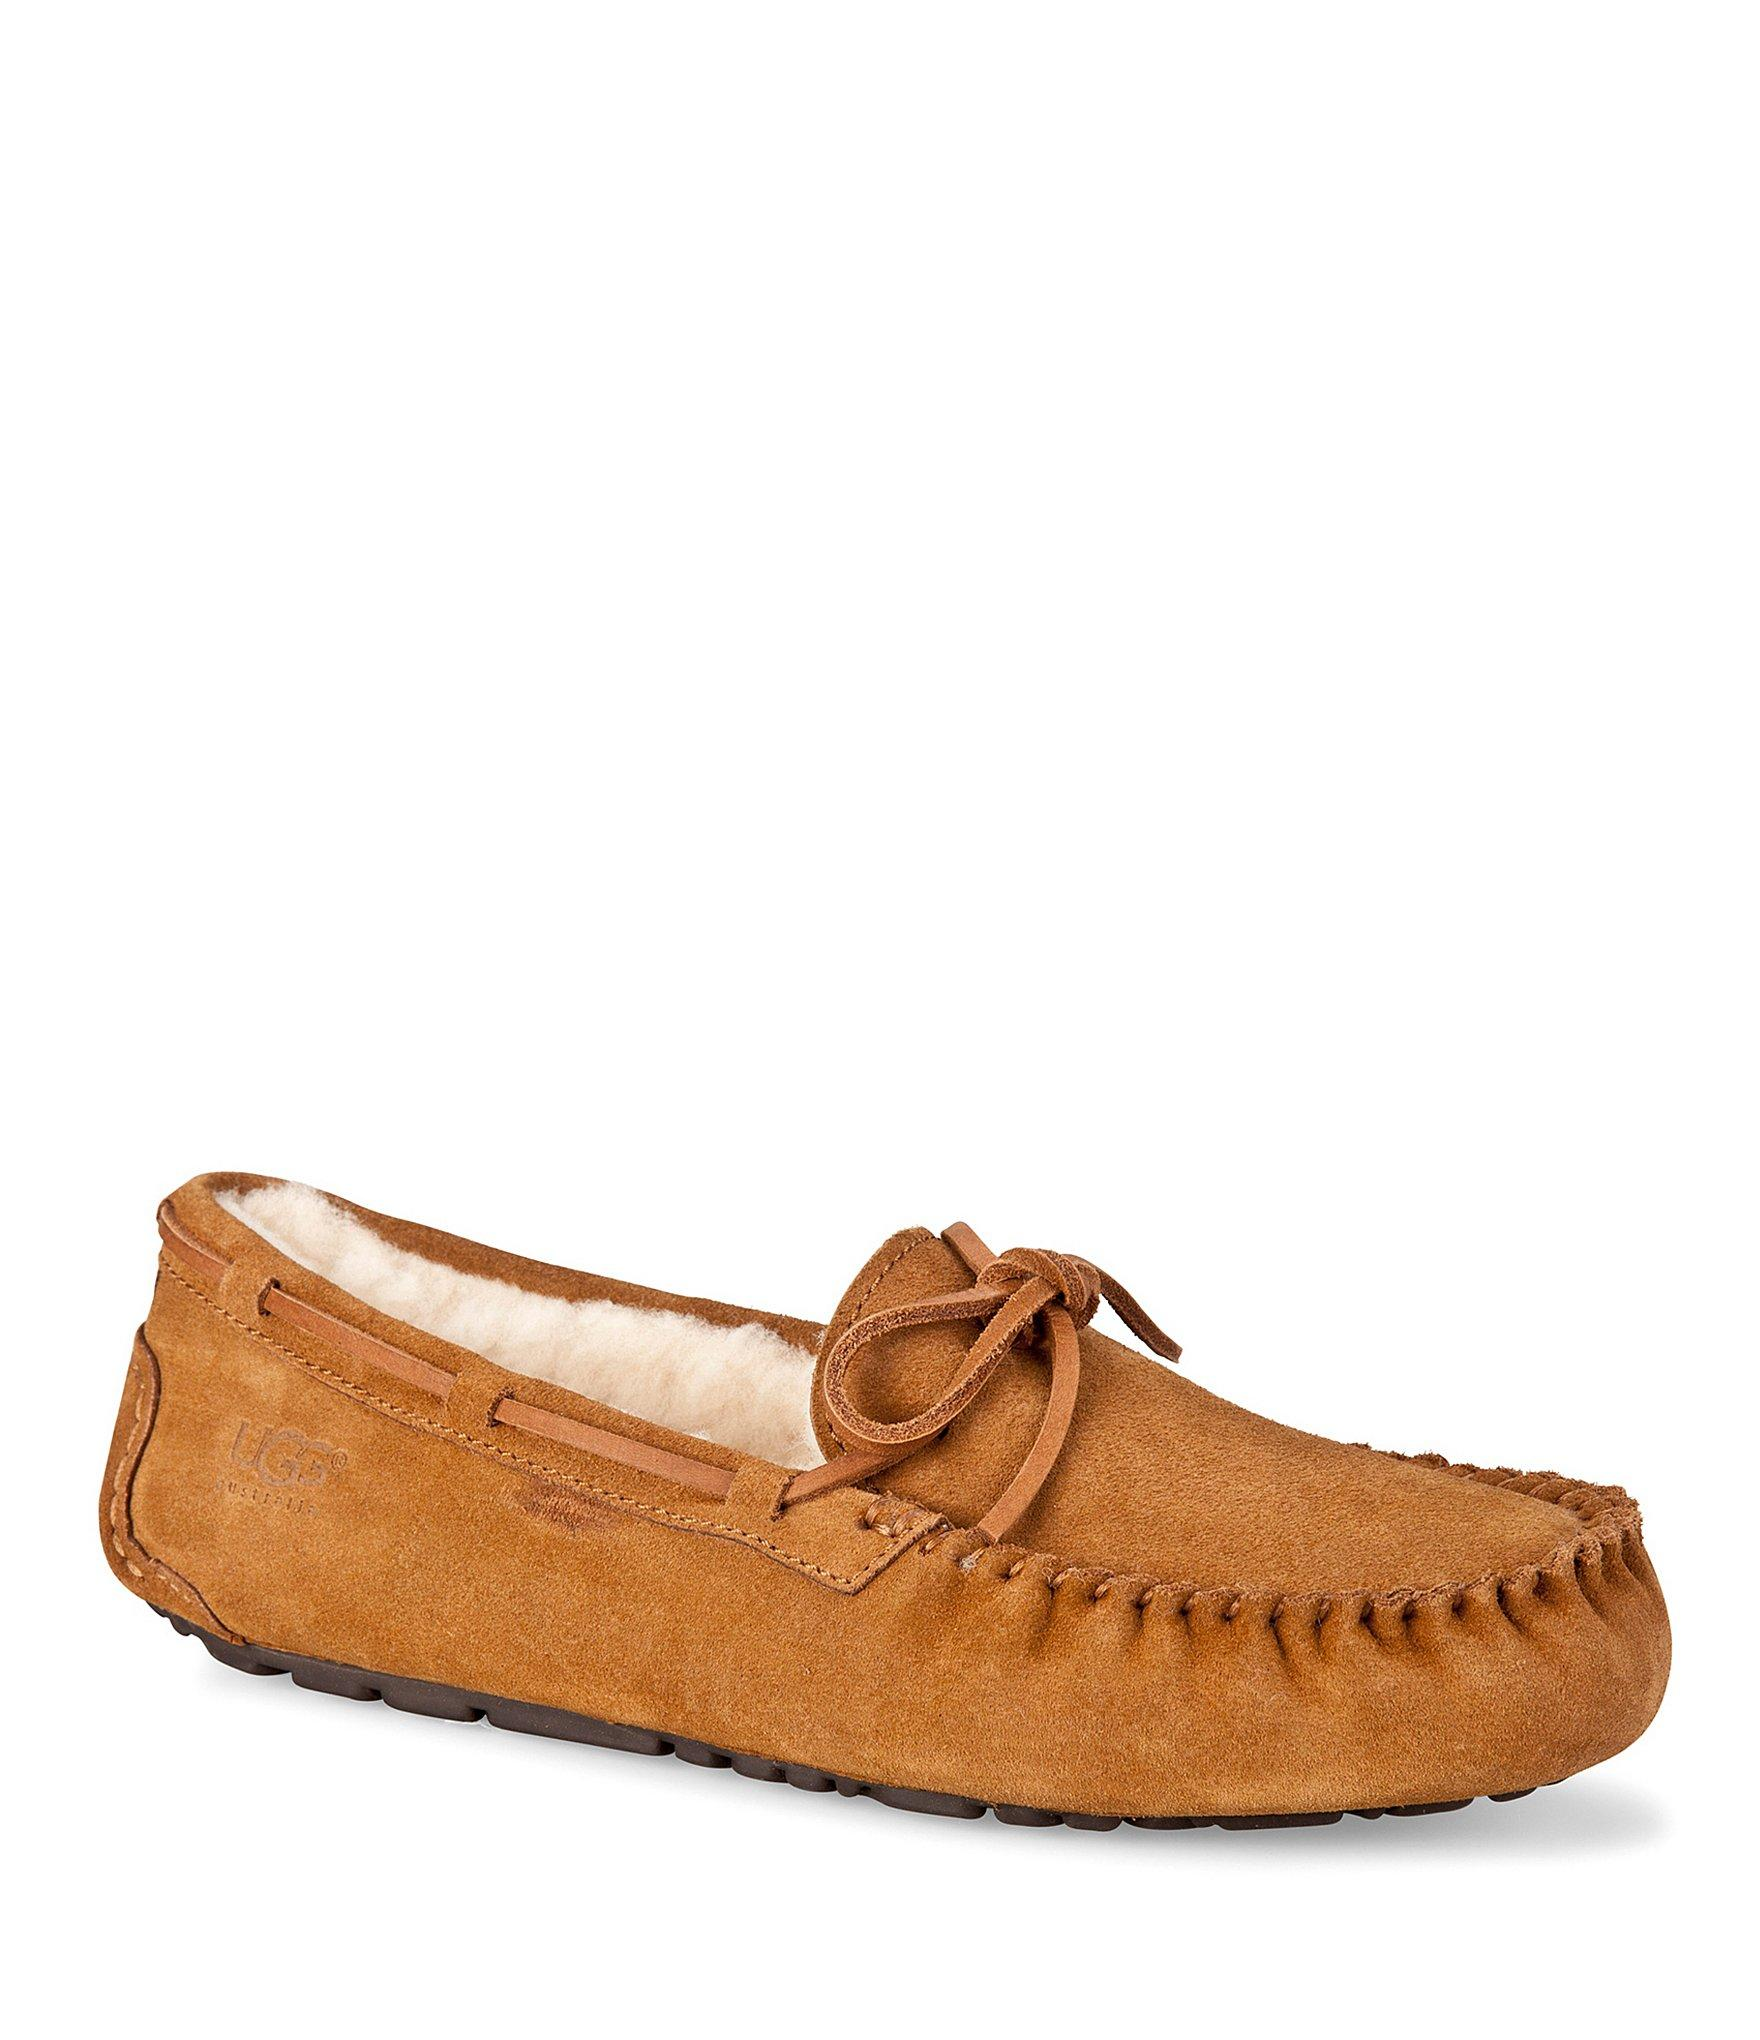 811e89a30281 Lyst - UGG Men s Olsen Suede Slippers in Brown for Men